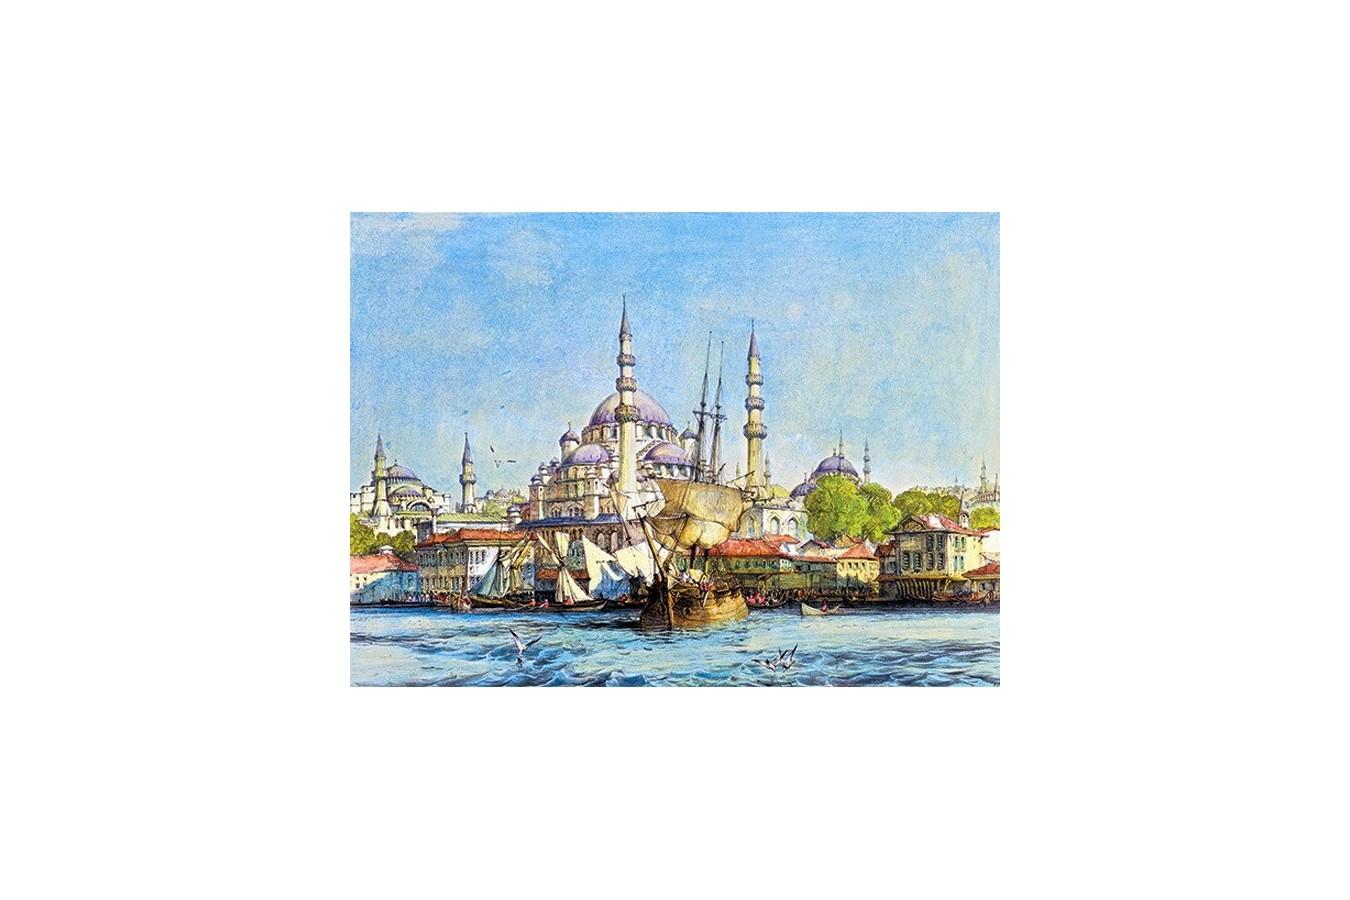 Puzzle Anatolian - Yeni Jami and Saint Sophia, 1000 piese (3166) imagine